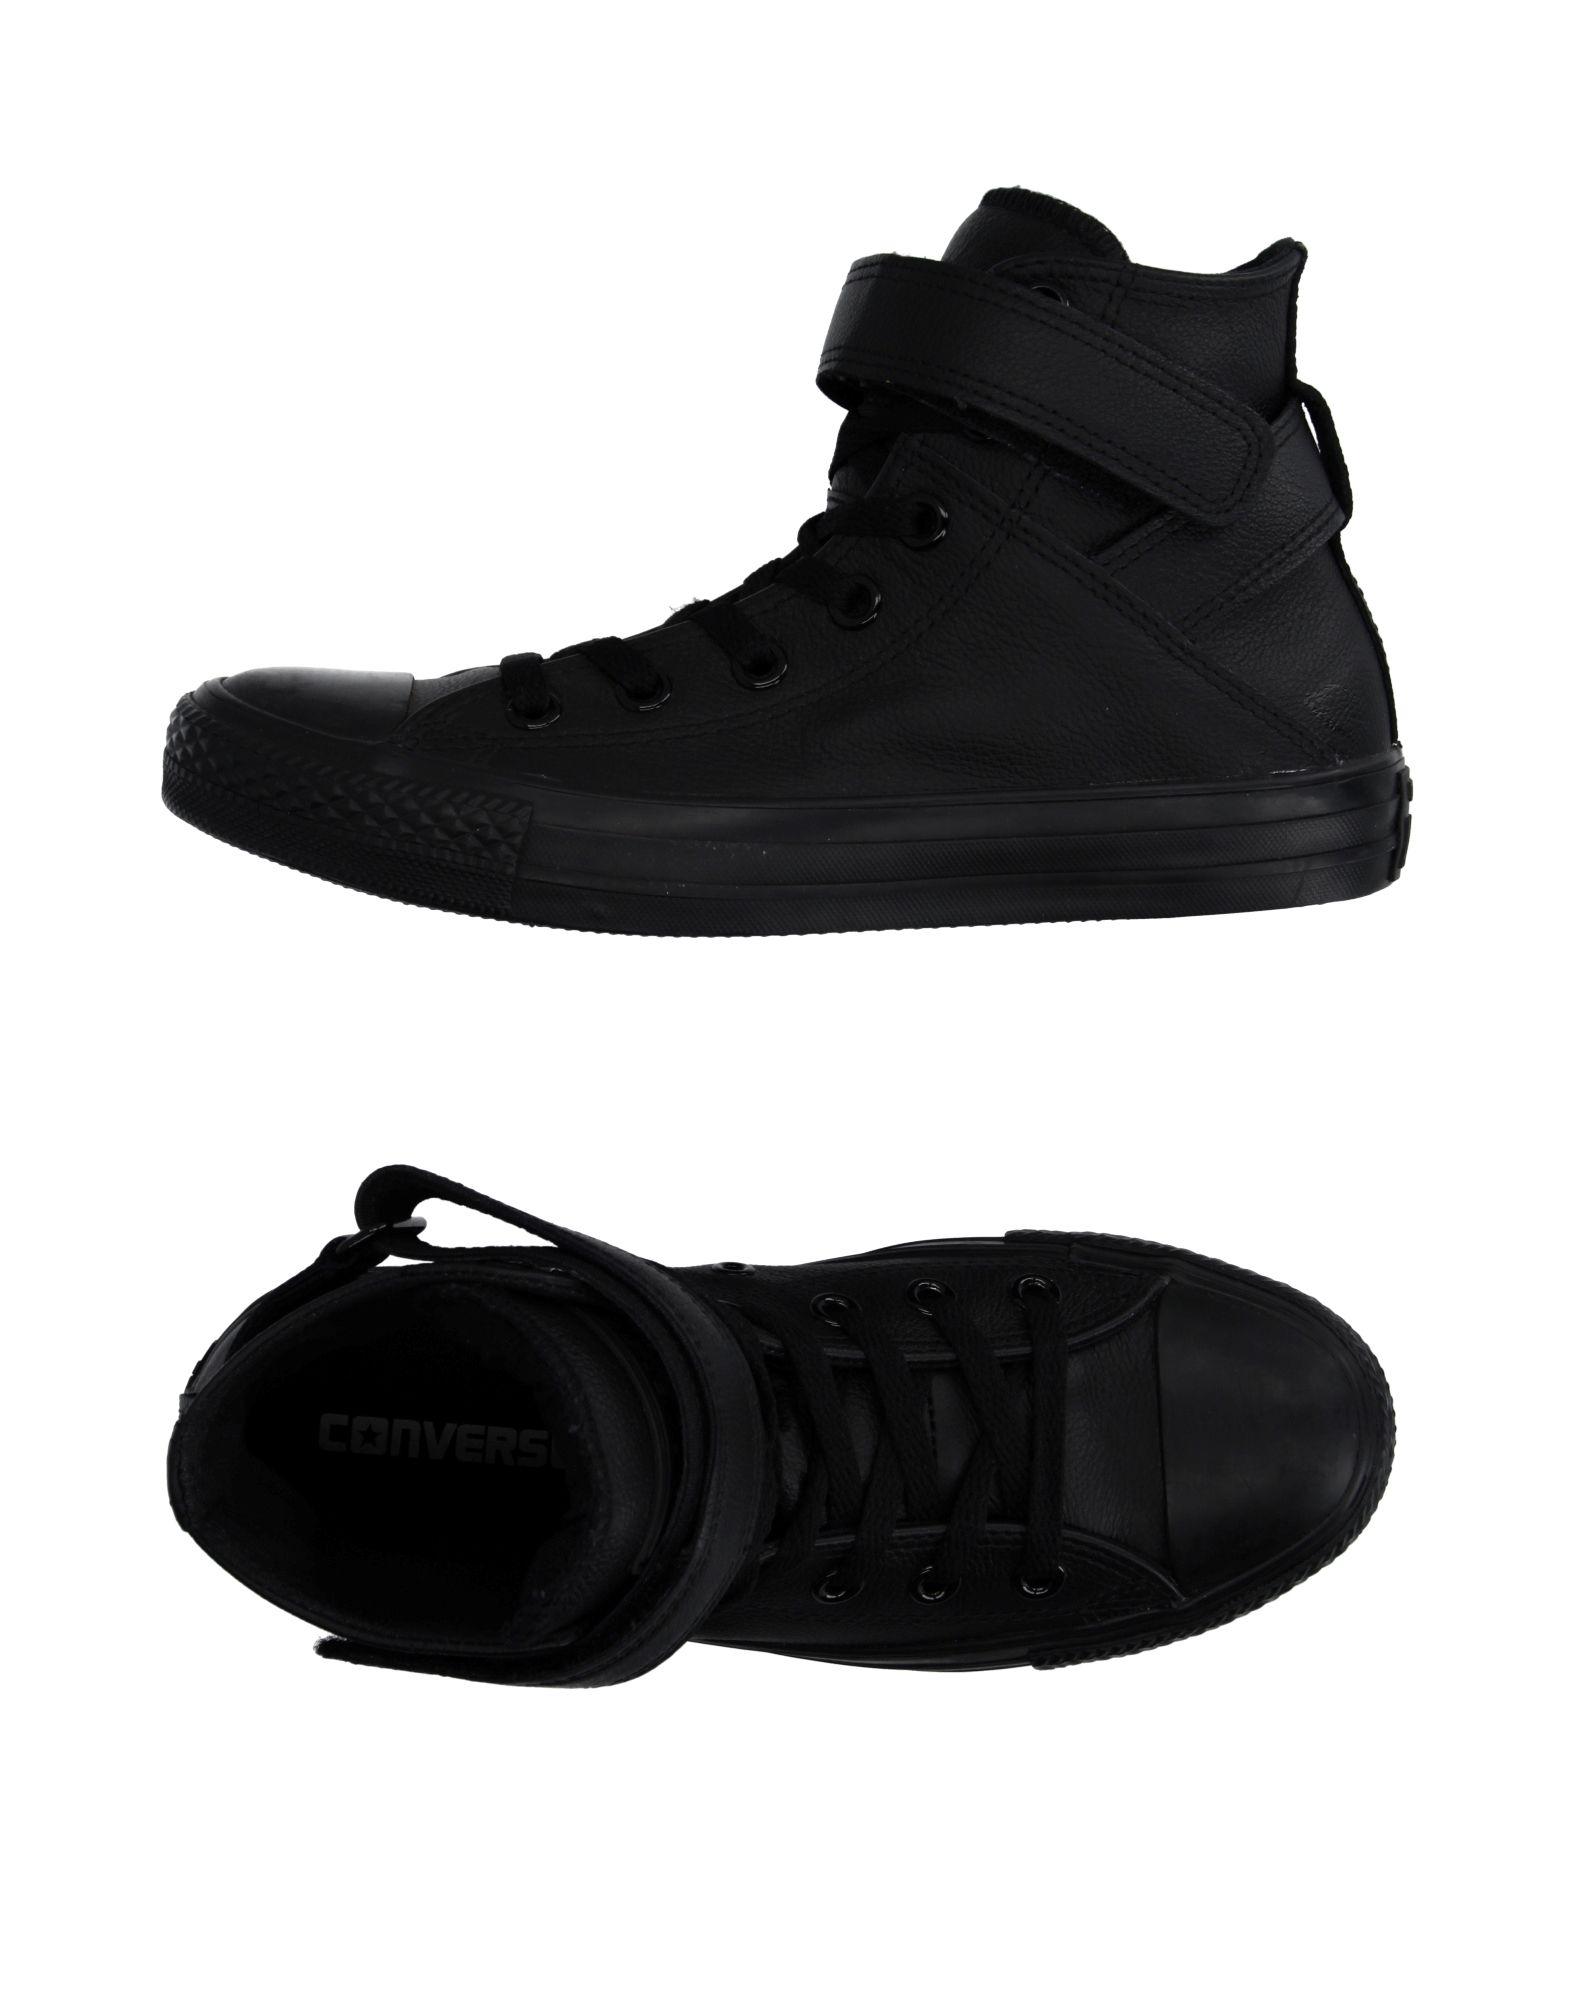 Converse All Sneakers Star Sneakers All Damen  11059392PC Gute Qualität beliebte Schuhe 607f3f